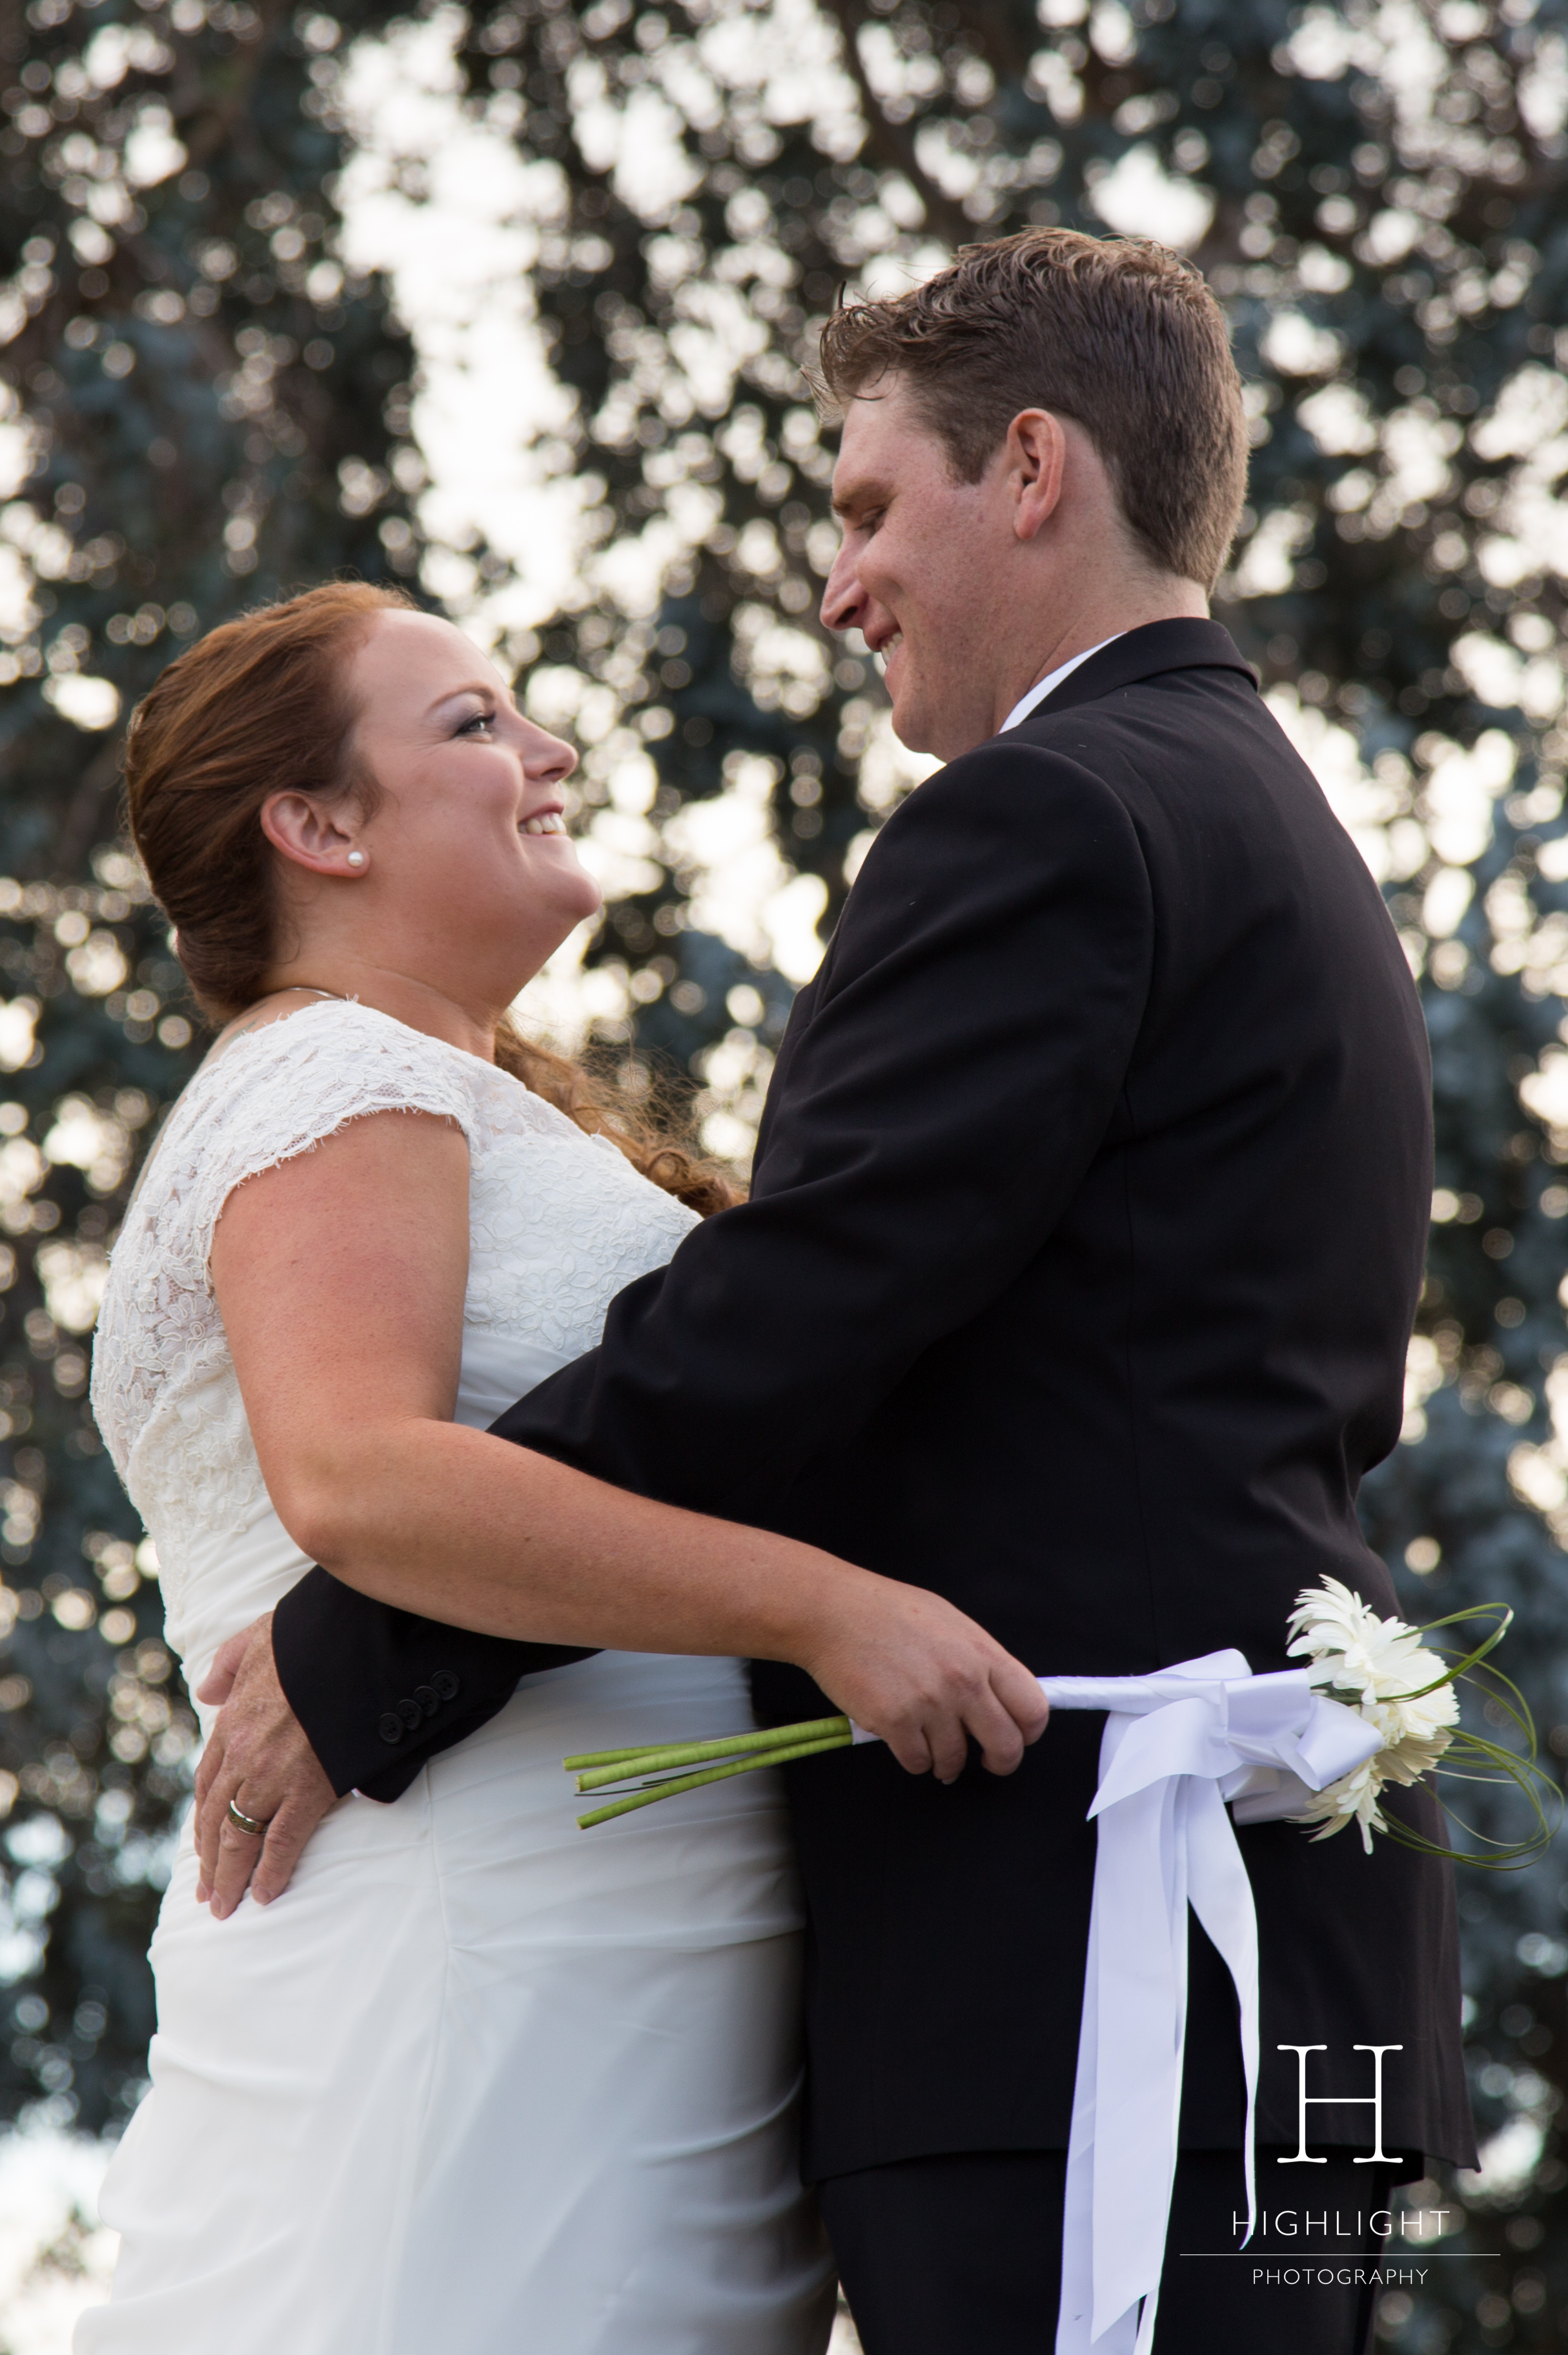 highlight_wedding_photography-palmerston-north_copthorne_masterton.jpg